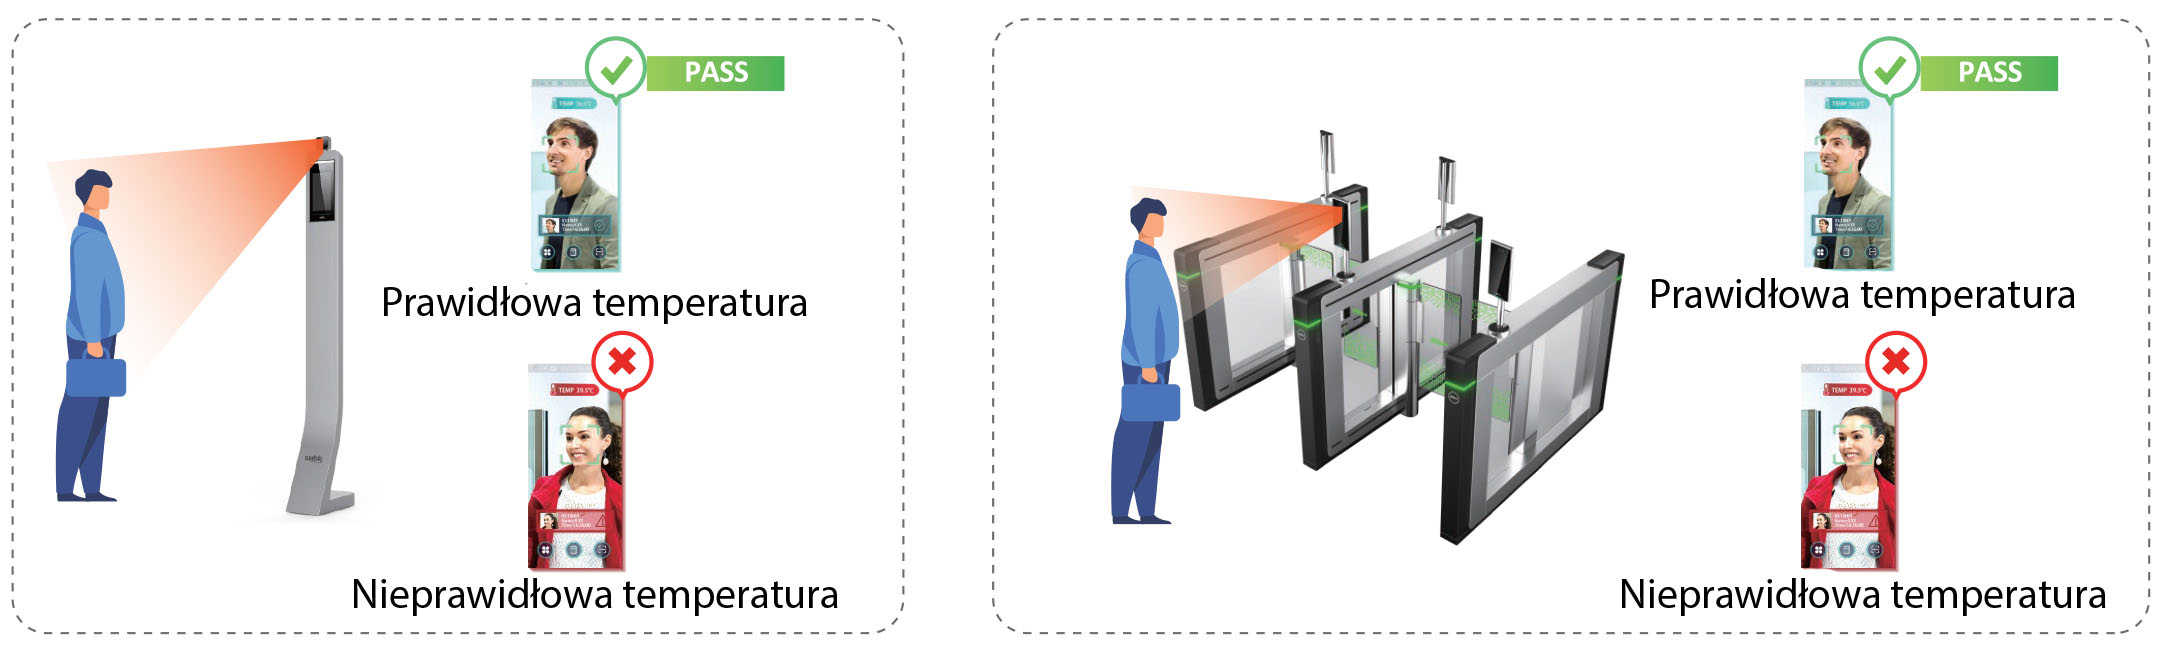 Temperature Monitoring Access Control May2020 2 kopia - Dahua DHI-ASI7213X-T1 Pomiar temperatury ciała, rozpoznawanie twarzy, kontrola dostępu